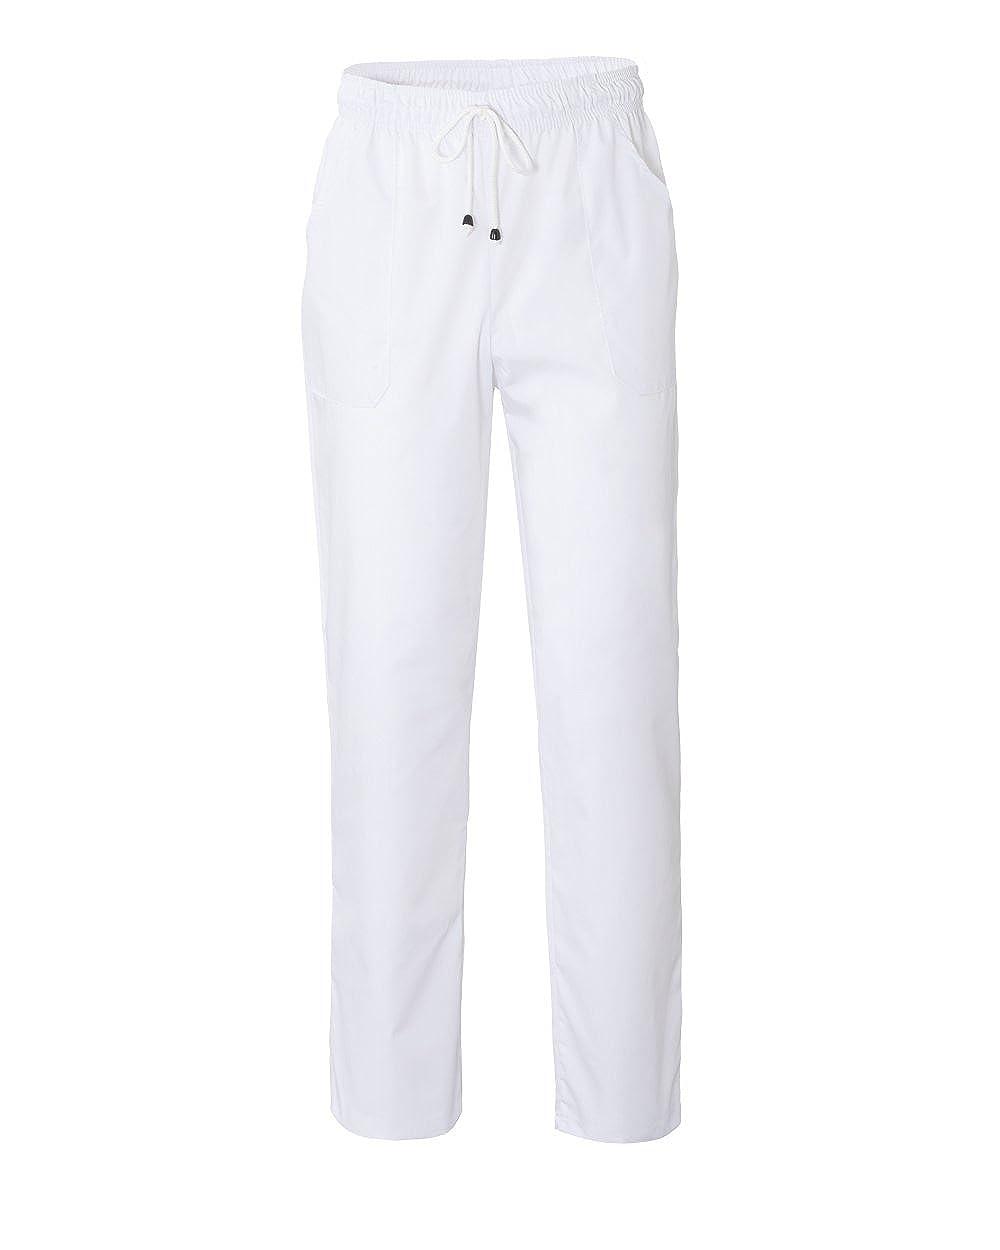 Pantalone ARISTOTELE 100% COTONE ANGIOLINA